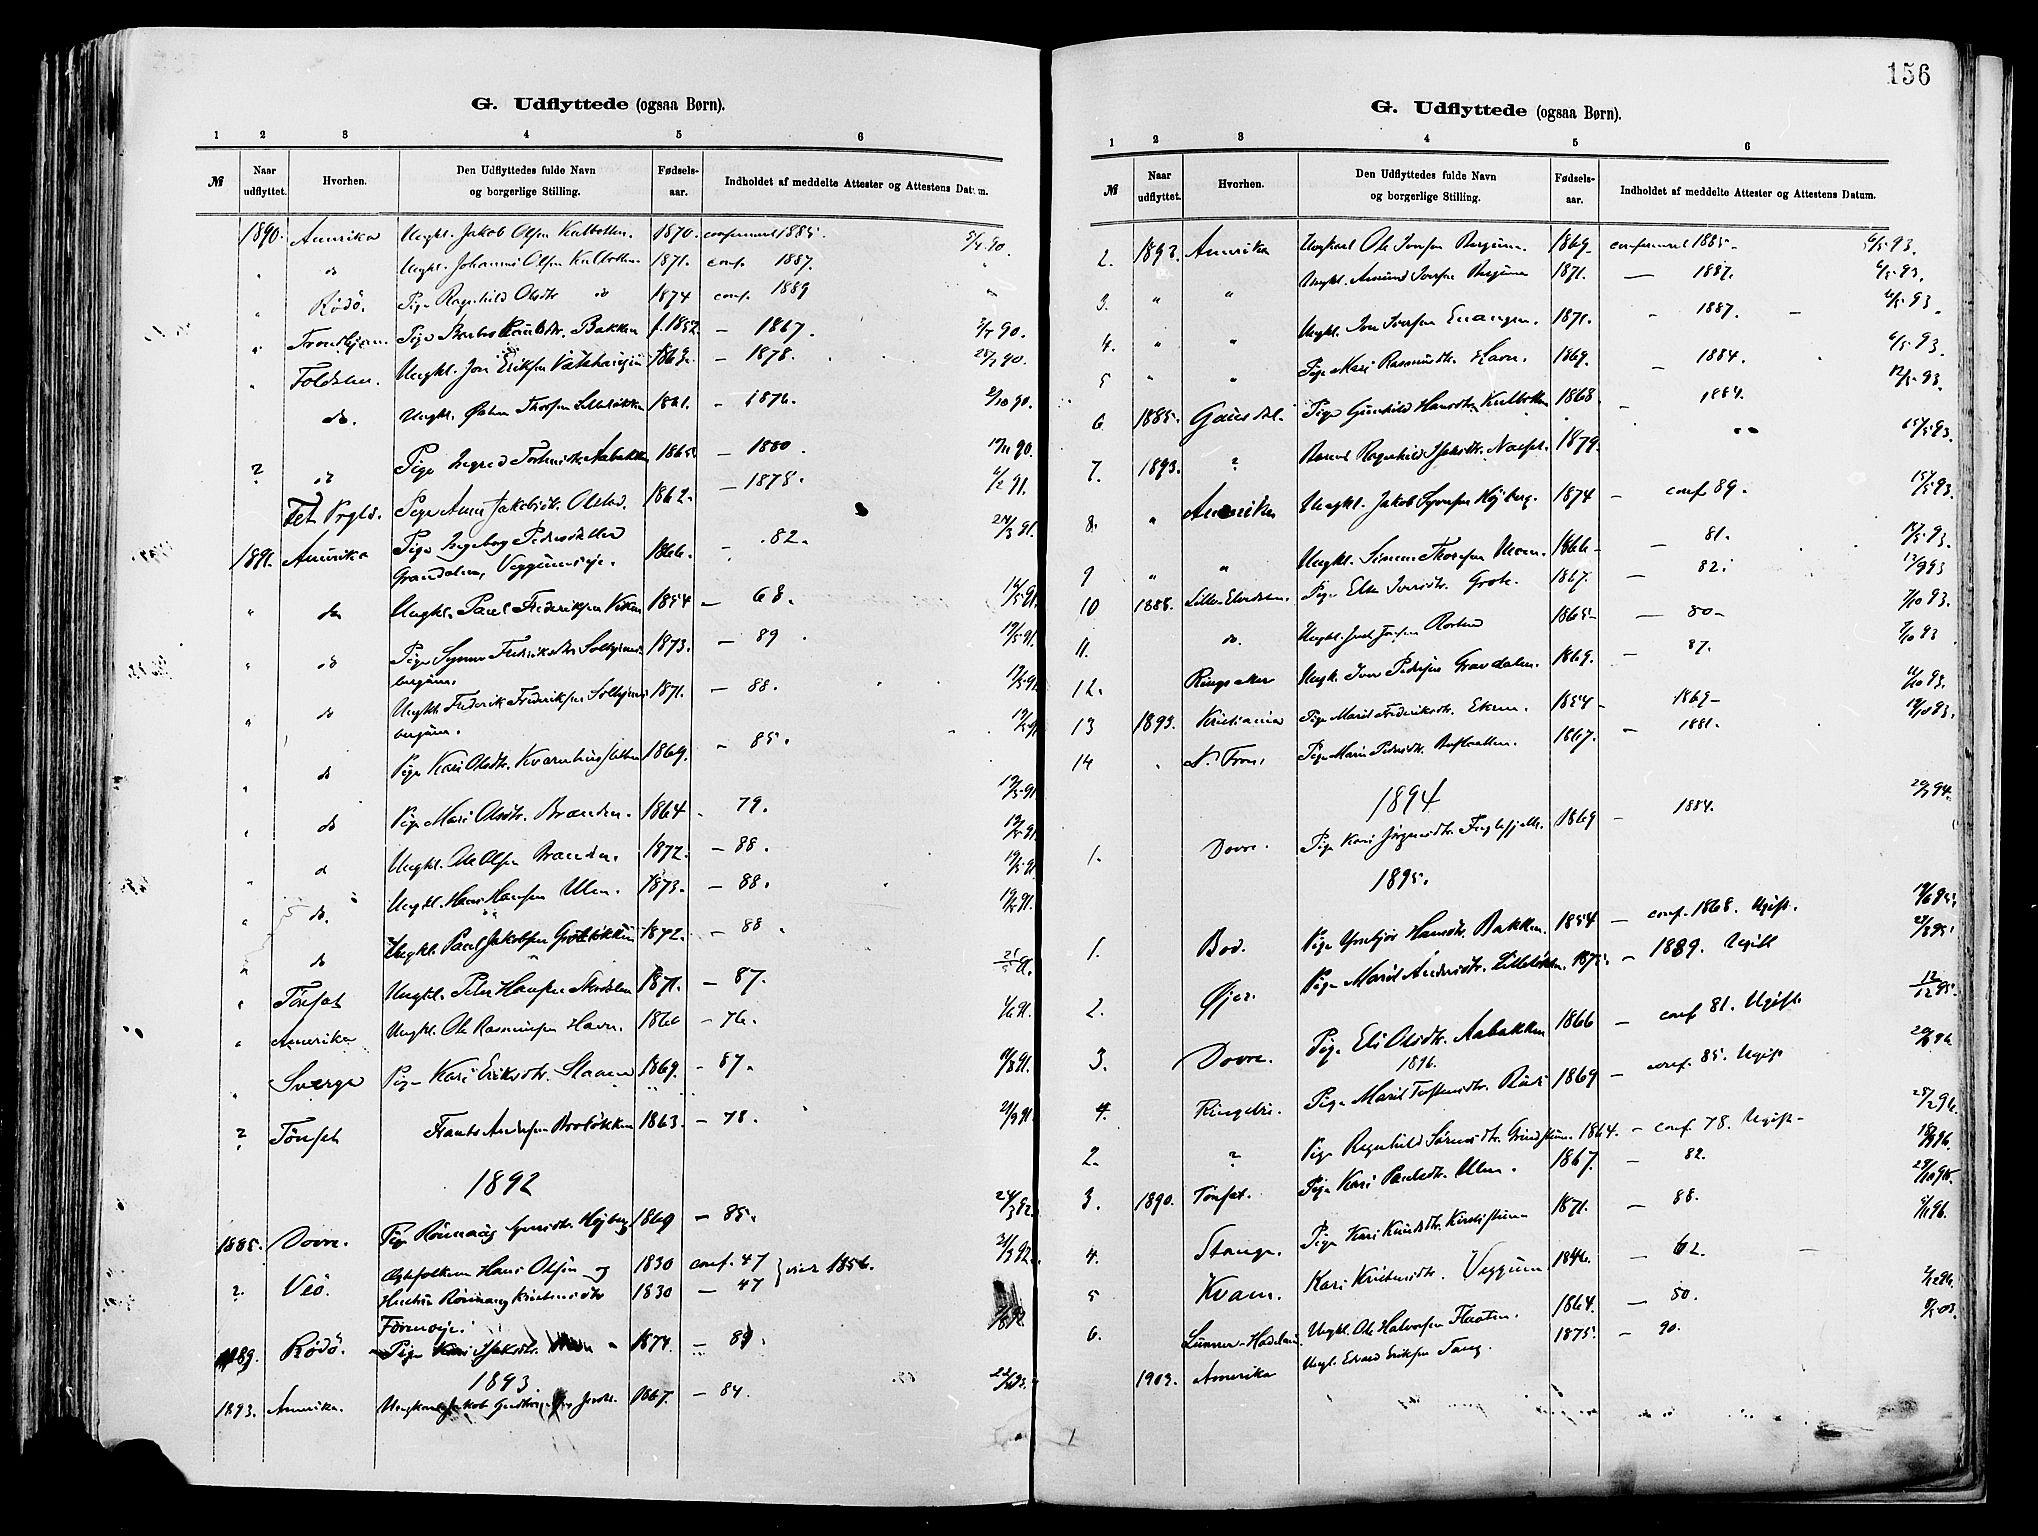 SAH, Vågå prestekontor, Ministerialbok nr. 8, 1886-1904, s. 156